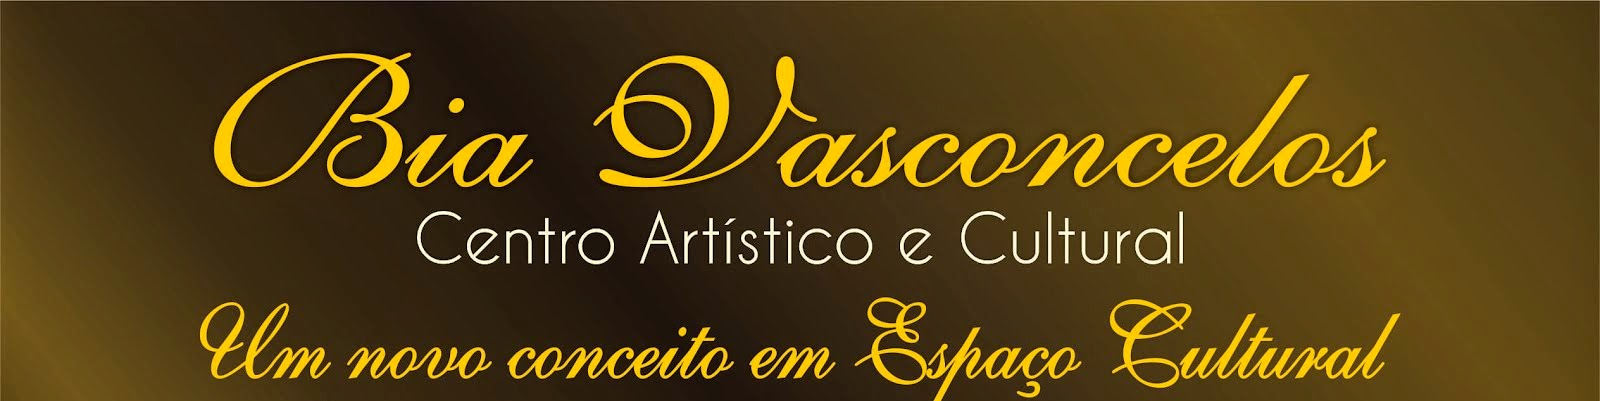 Bia Vasconcelos Centro Artístico e Cultural